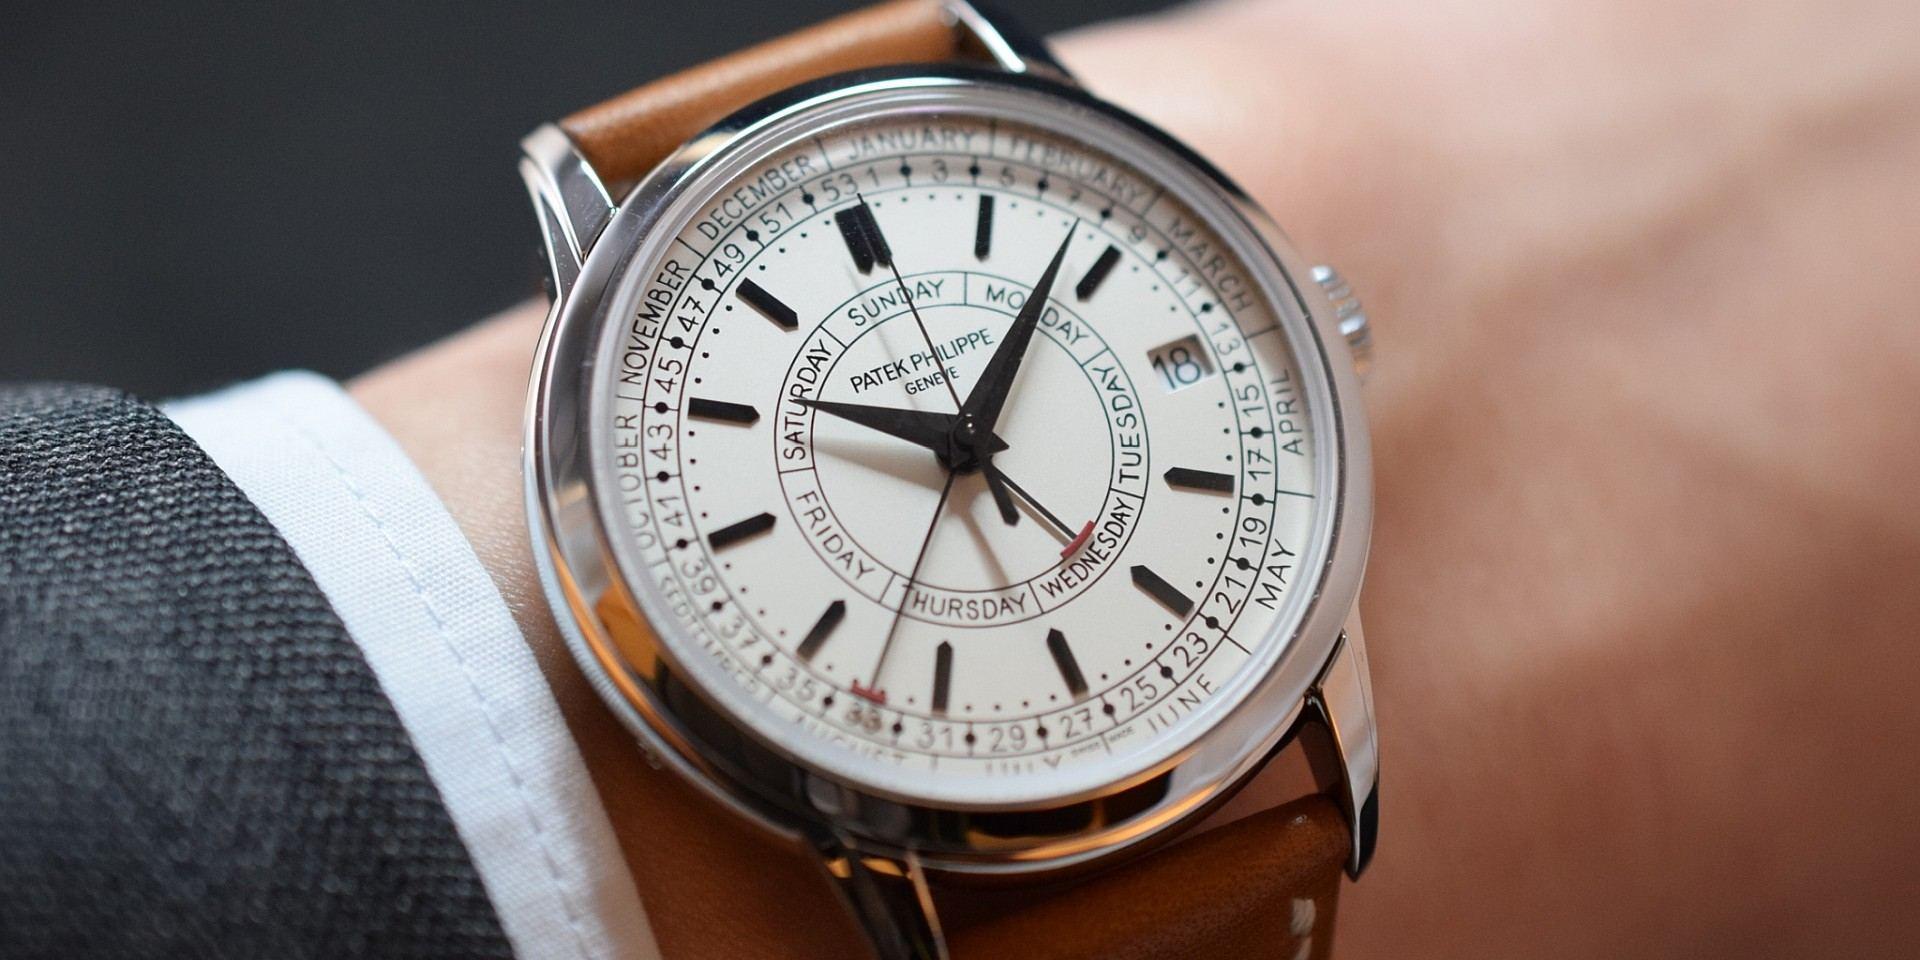 【2019 BASEL錶展報導】嶄新複雜功能鋼錶:百達翡麗Calatrava Ref.5212A-001週曆時計